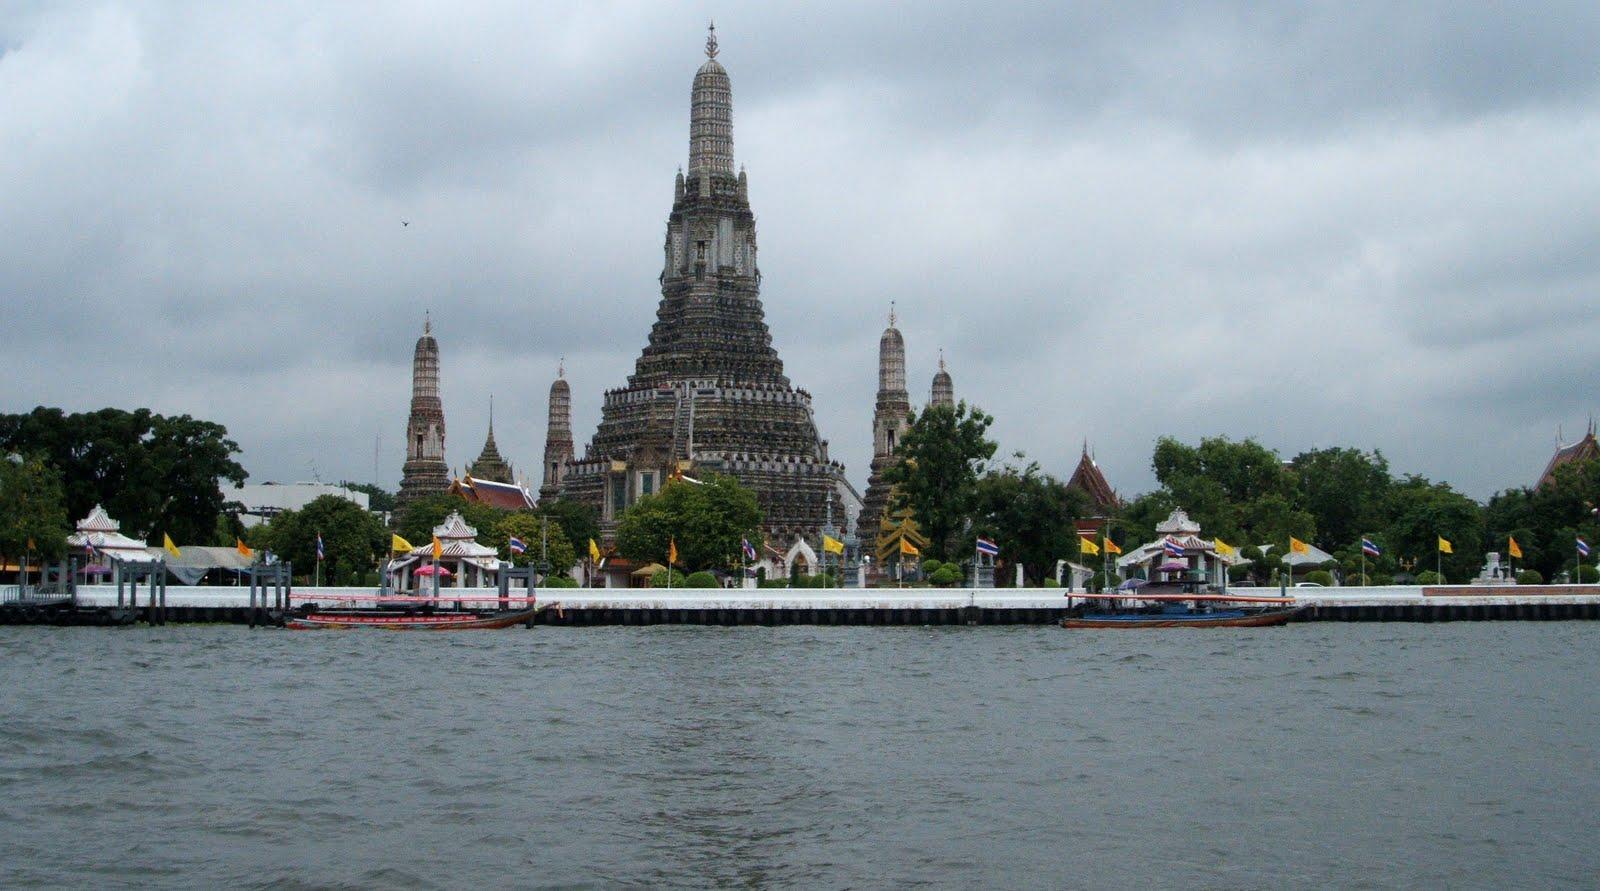 Bangkok-wat+arun+ratchwararam+di+tepi+sungai+chao+phraya